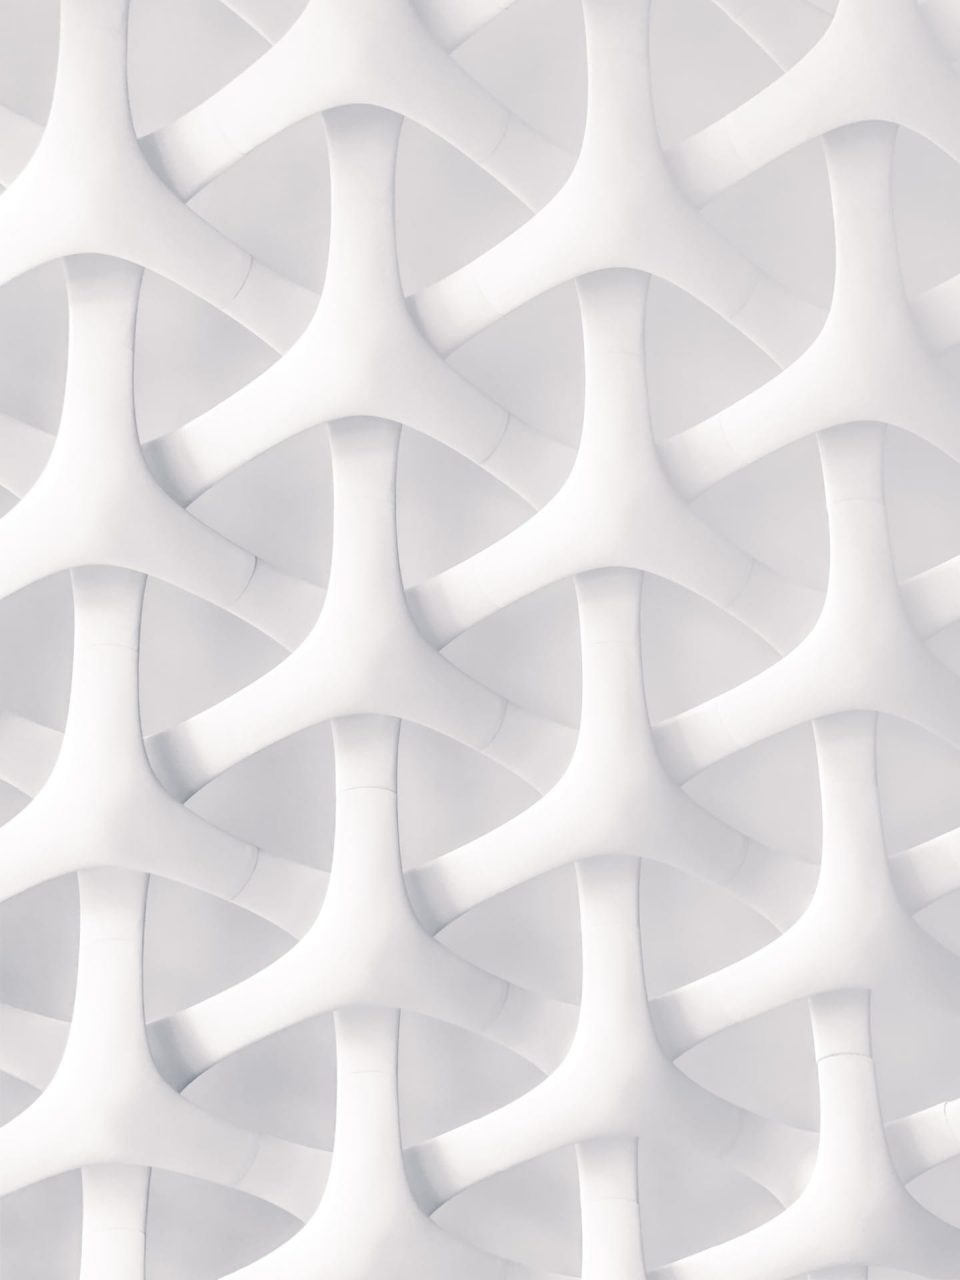 Random pattern of white vPCV strips.